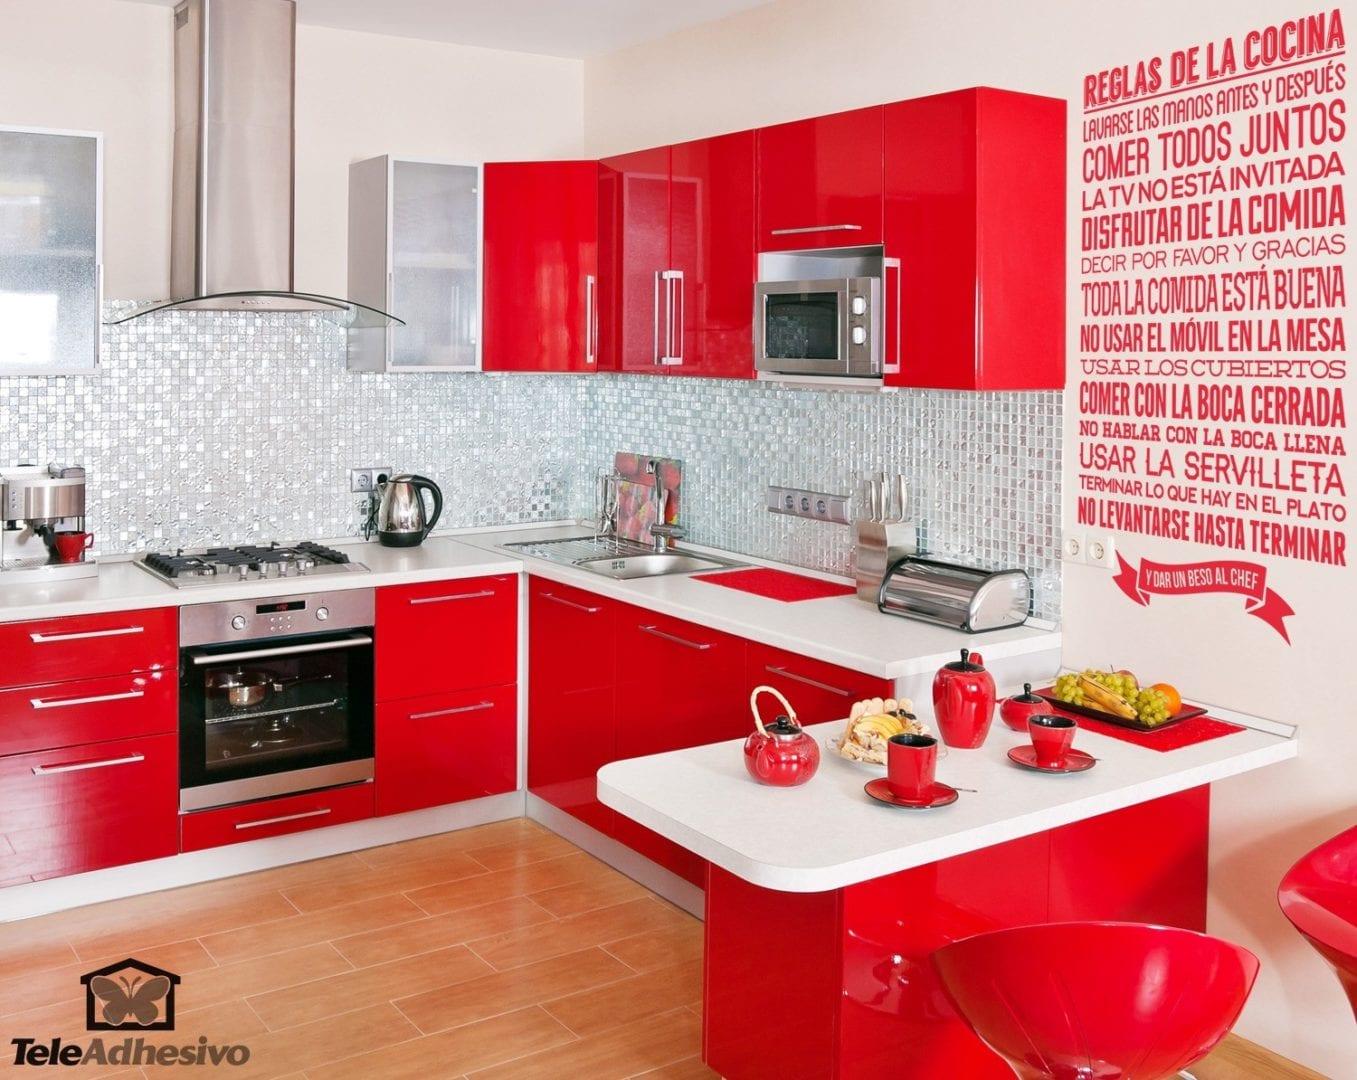 Cocinova vinilos para cocina vinilos decorativos reglas de for Vinilos decorativos pared cocina